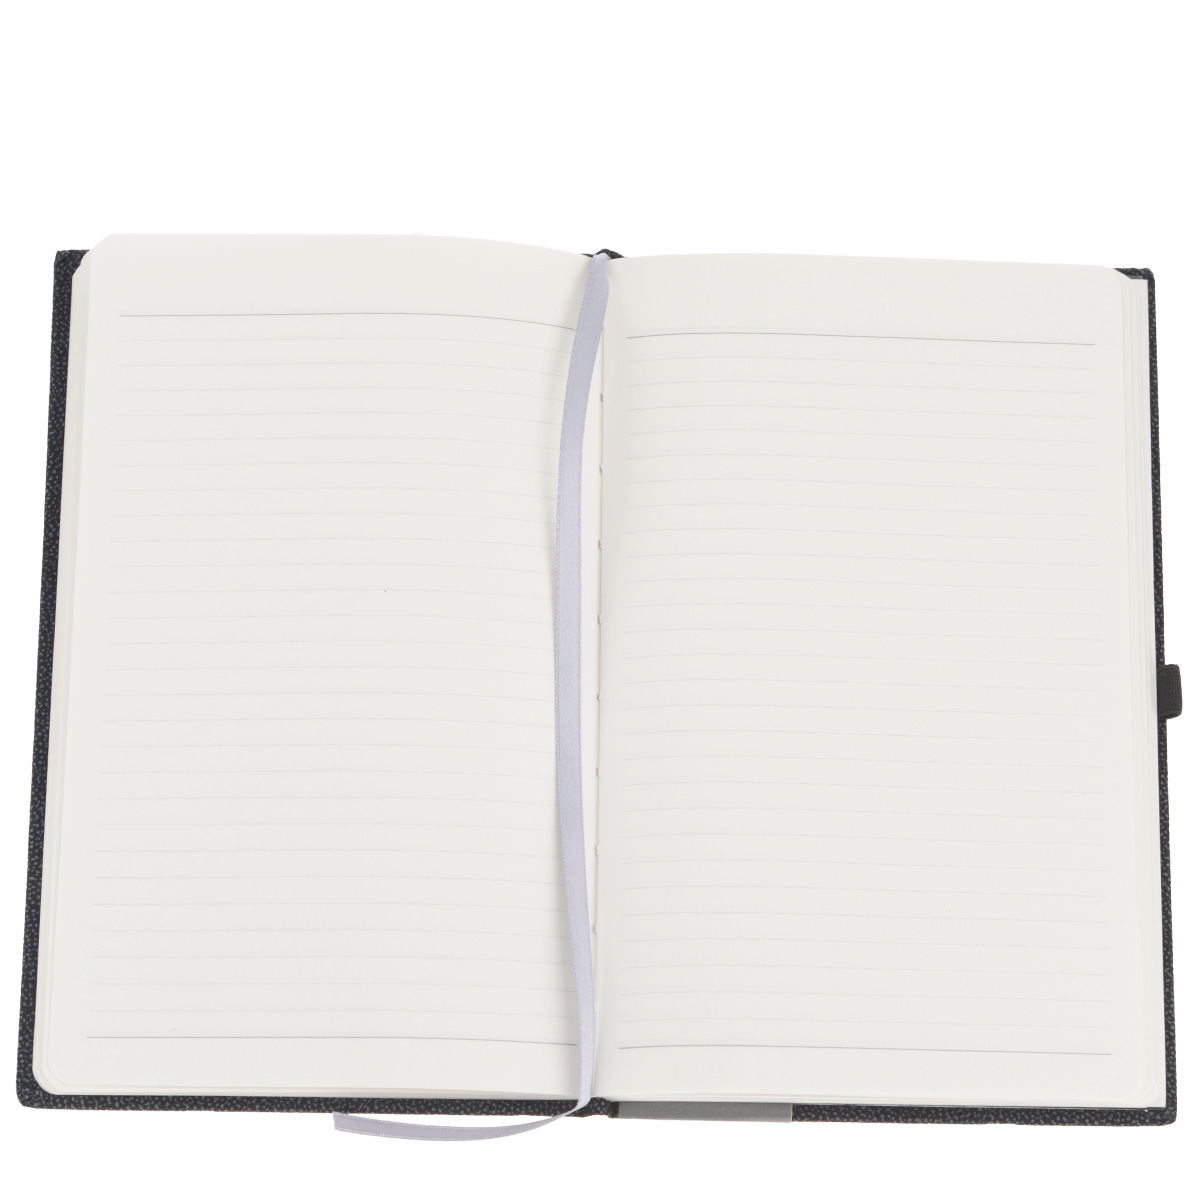 "Записная книжка Erich Krause ""Tann"", цвет: черный, 96 листов"